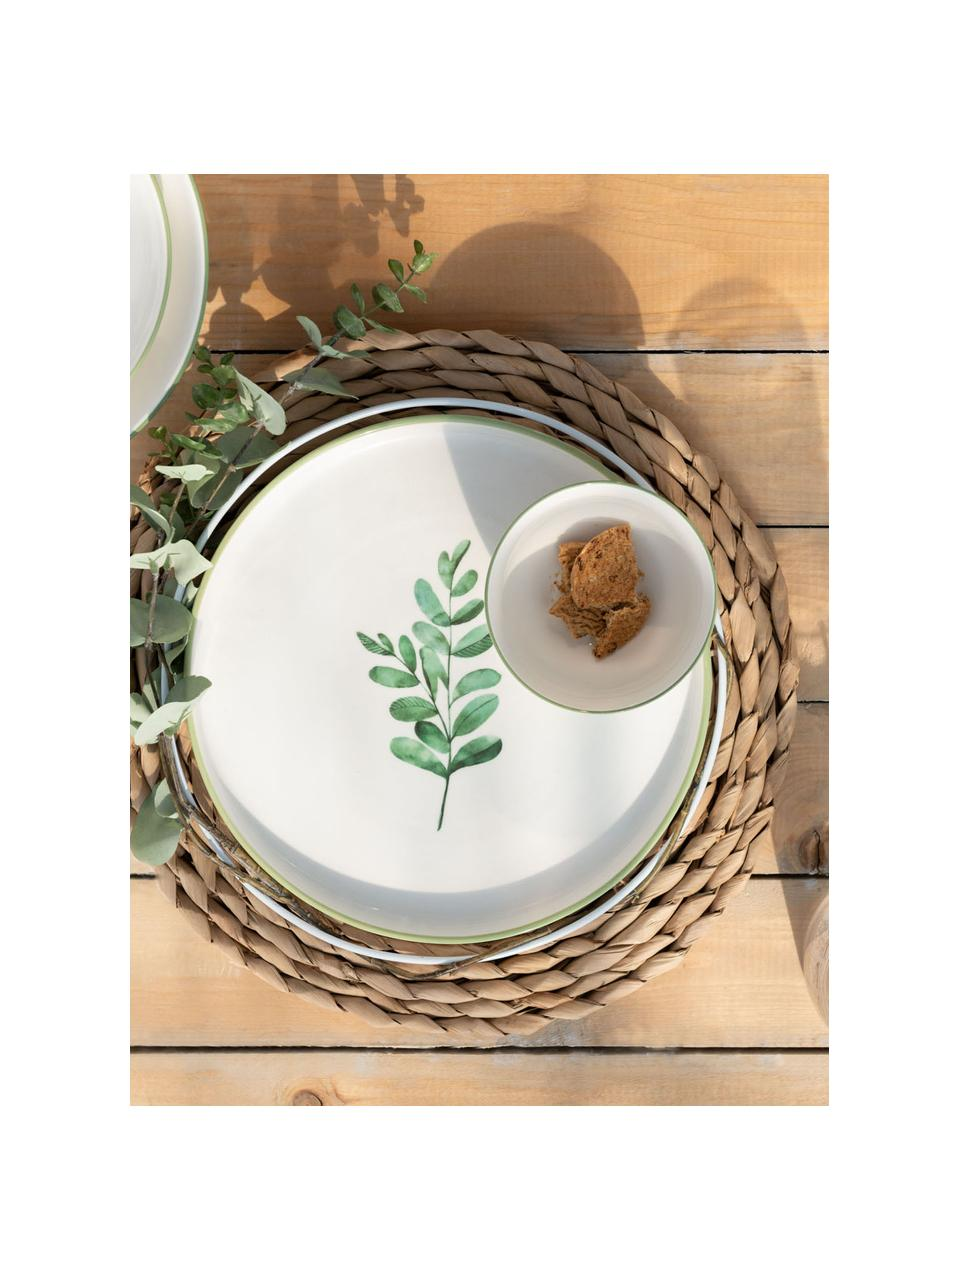 Ontbijtbord Eukalyptus, 4 stuks, Porselein, Wit, groen, Ø 24 cm